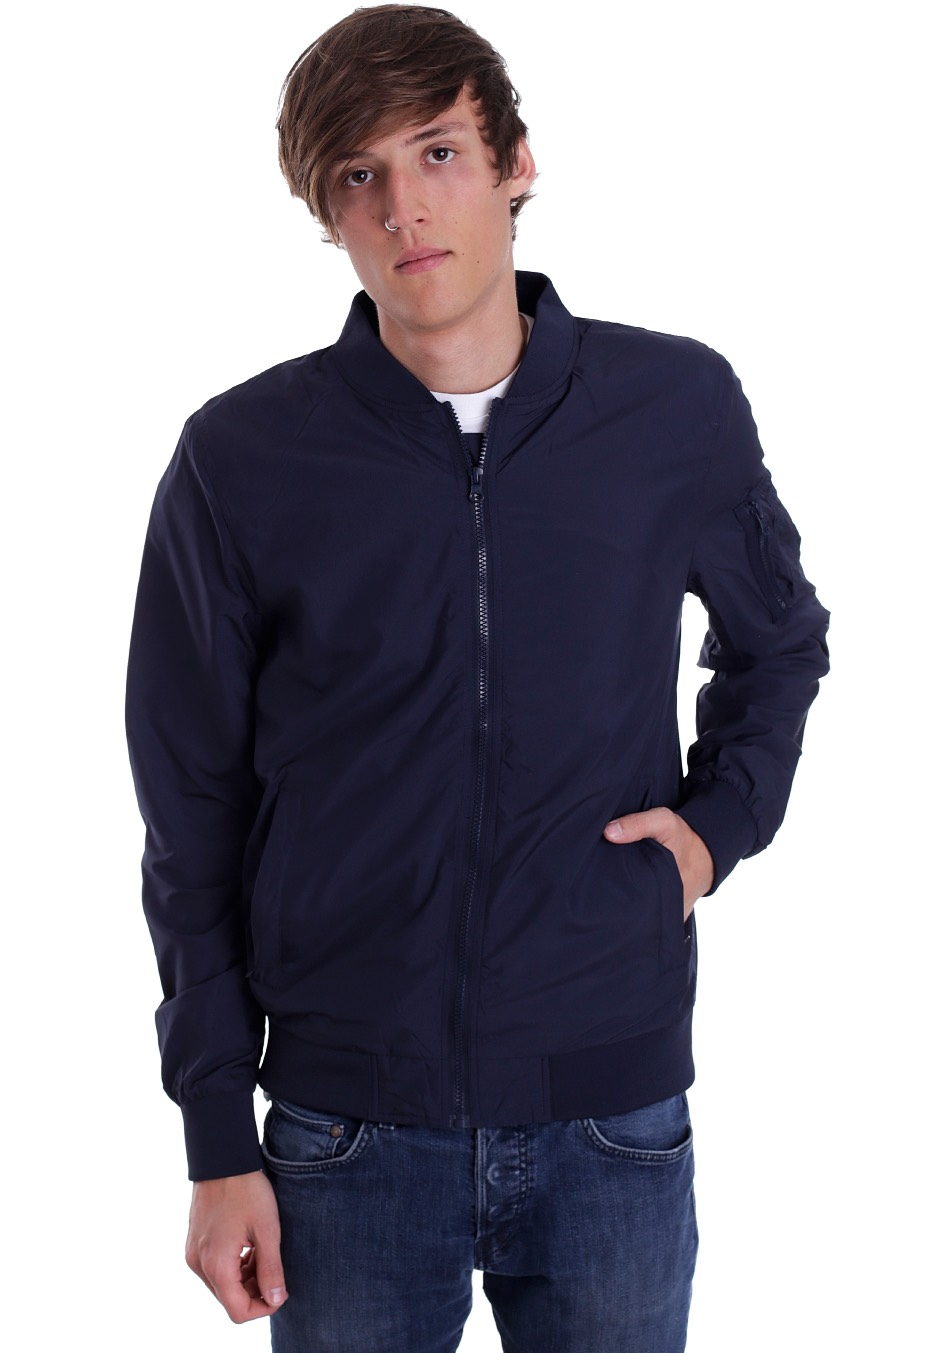 271ed0f516160 Urban Classics - Light Bomber Navy - Jacket - Streetwear Shop -  Impericon.com US